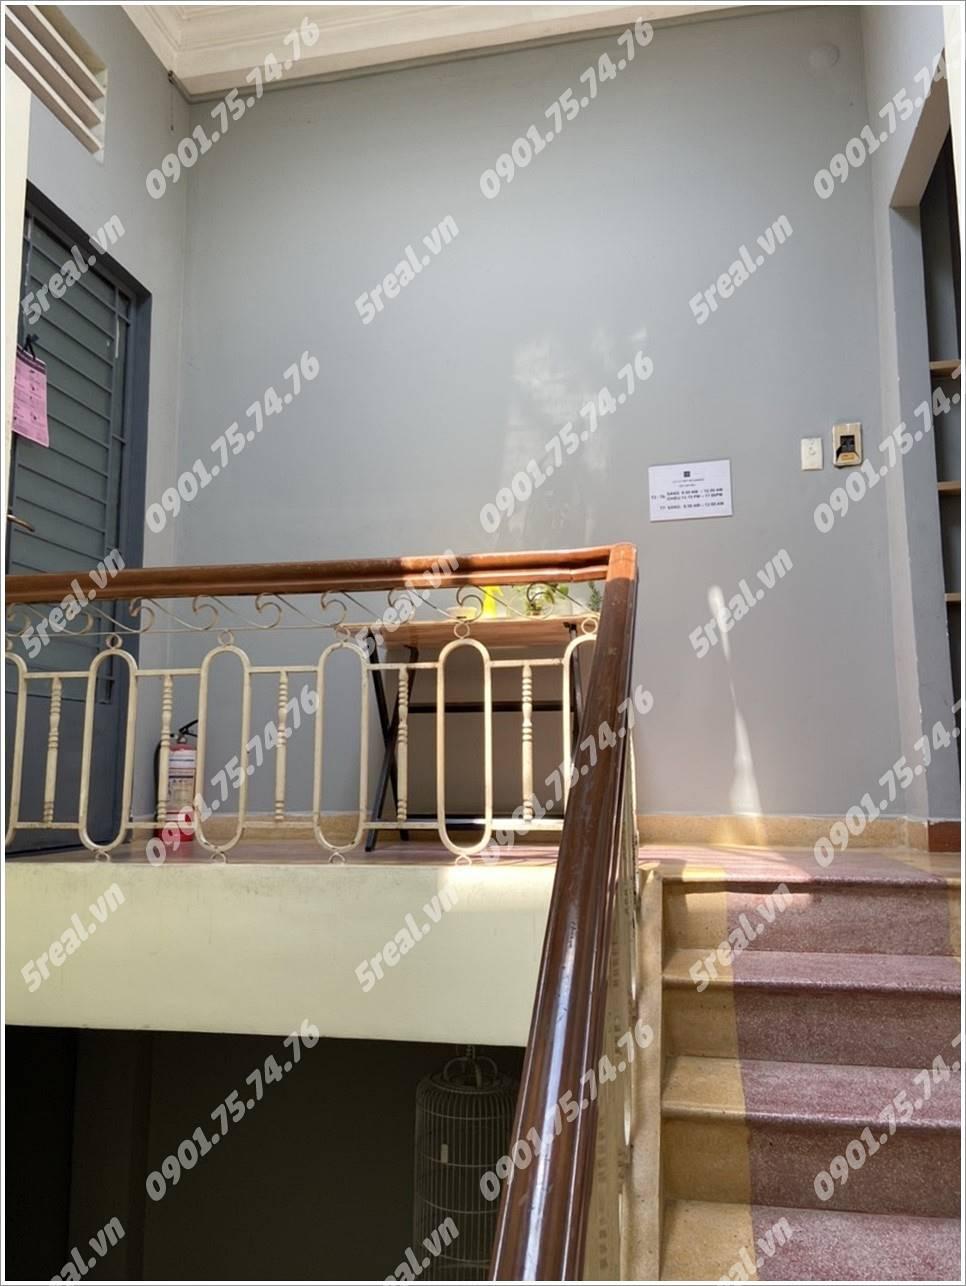 tien-giang-building-quan-tan-binh-van-phong-cho-thue-tphcm-5real.vn-02